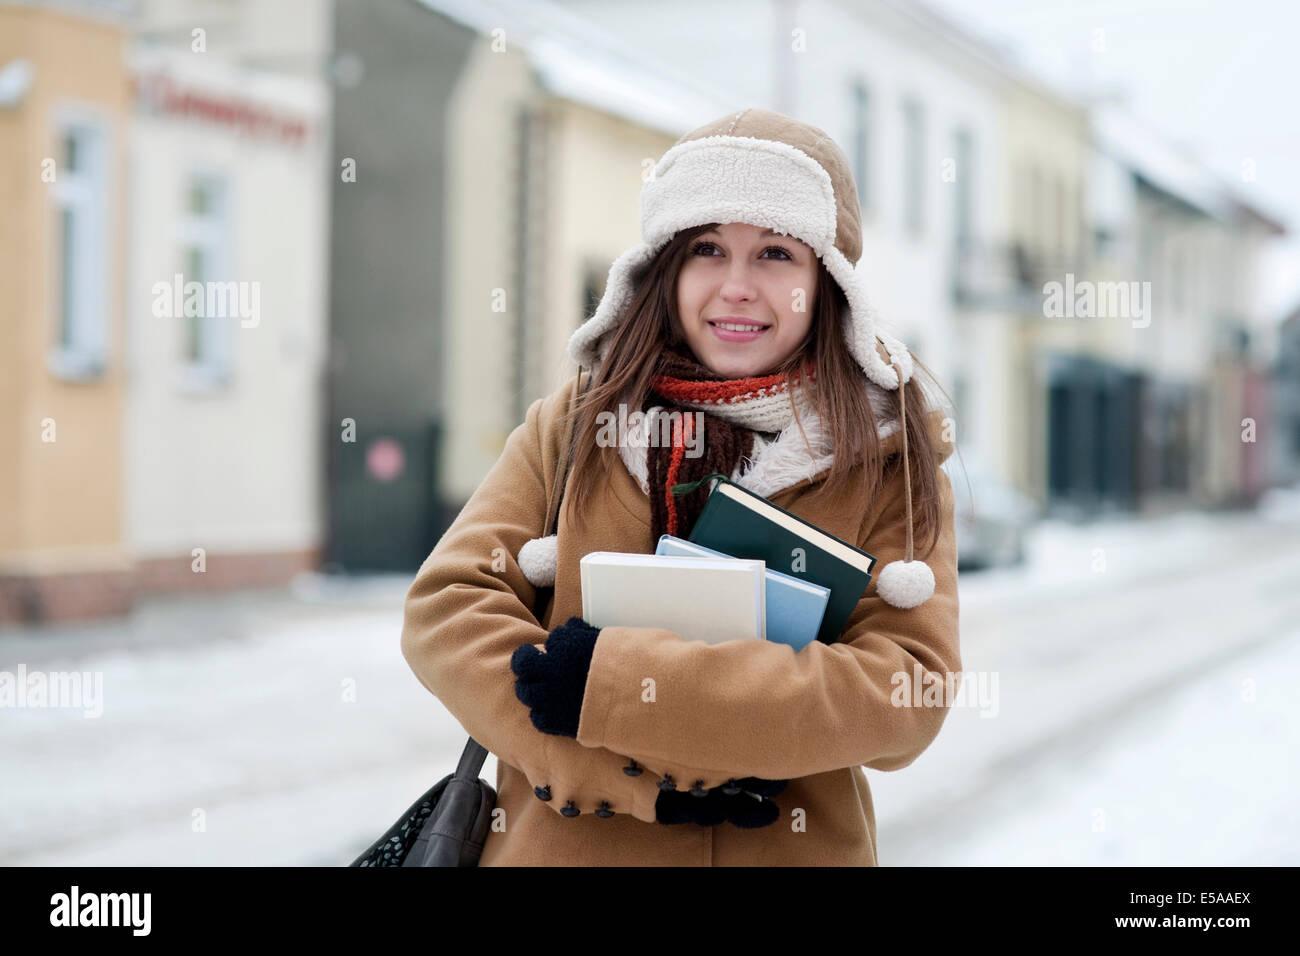 Student girl, wintertime. Debica, Poland. - Stock Image